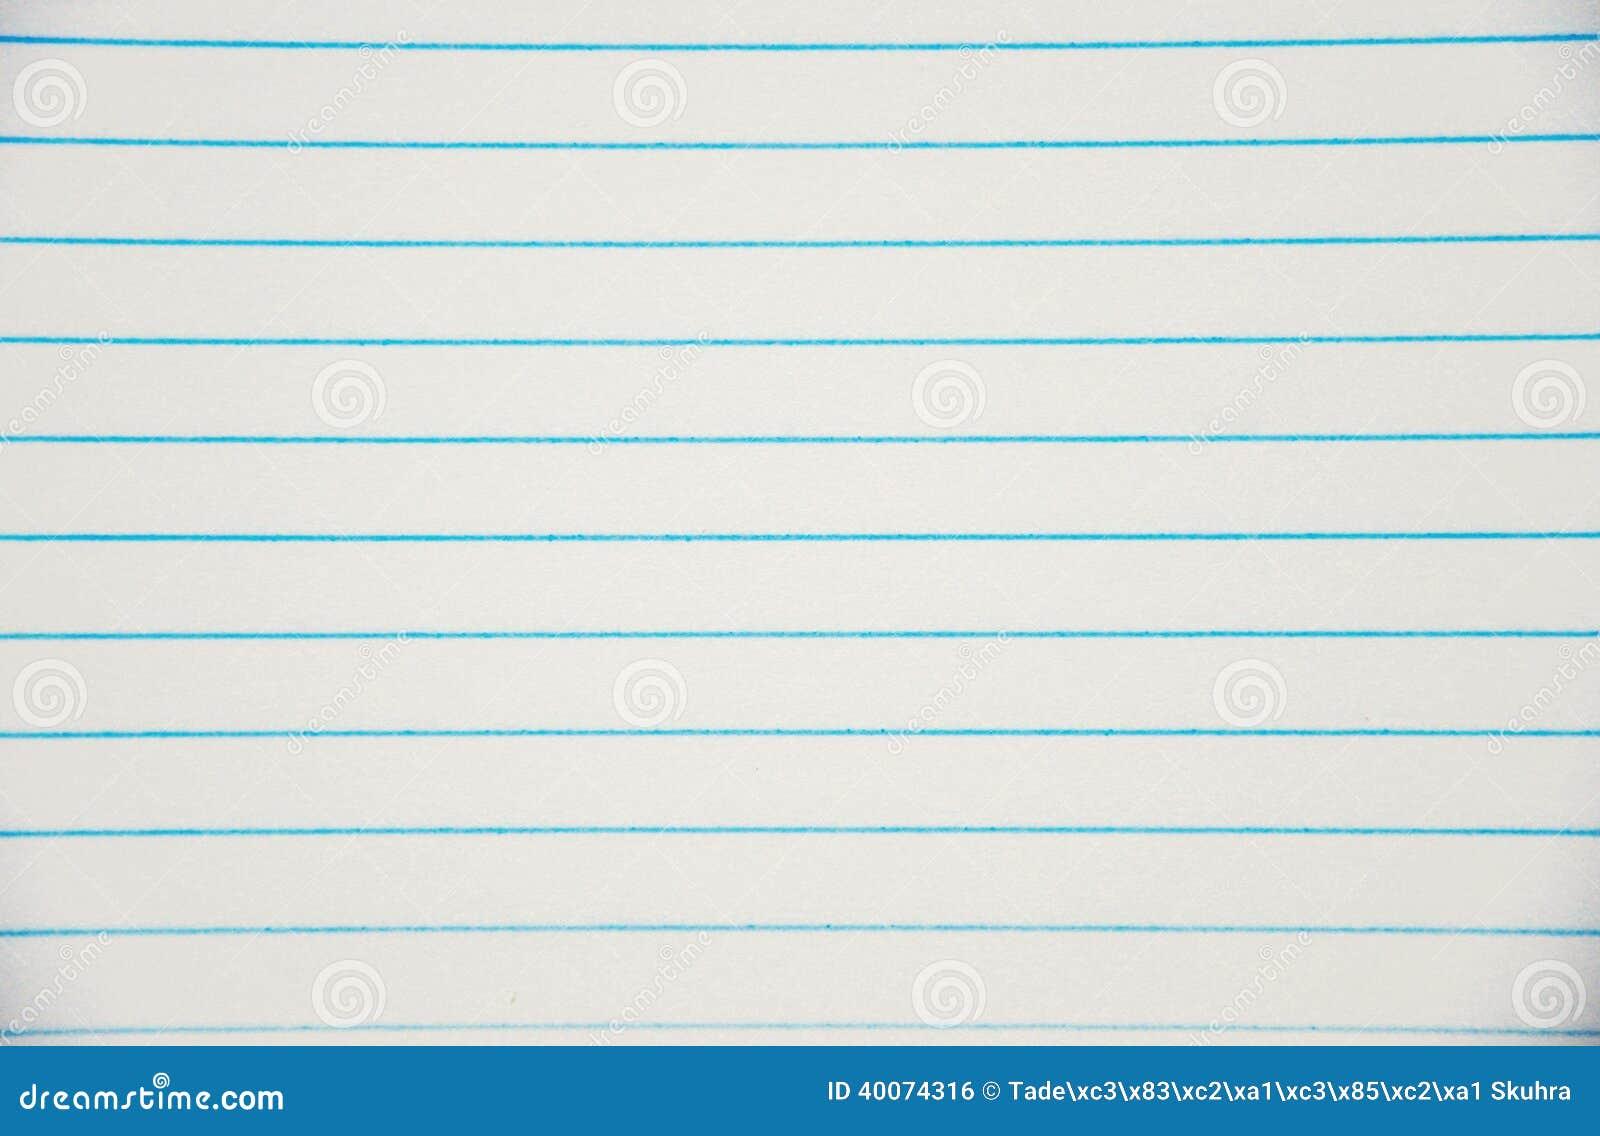 Line Sheets Stock Illustration Image 40074316